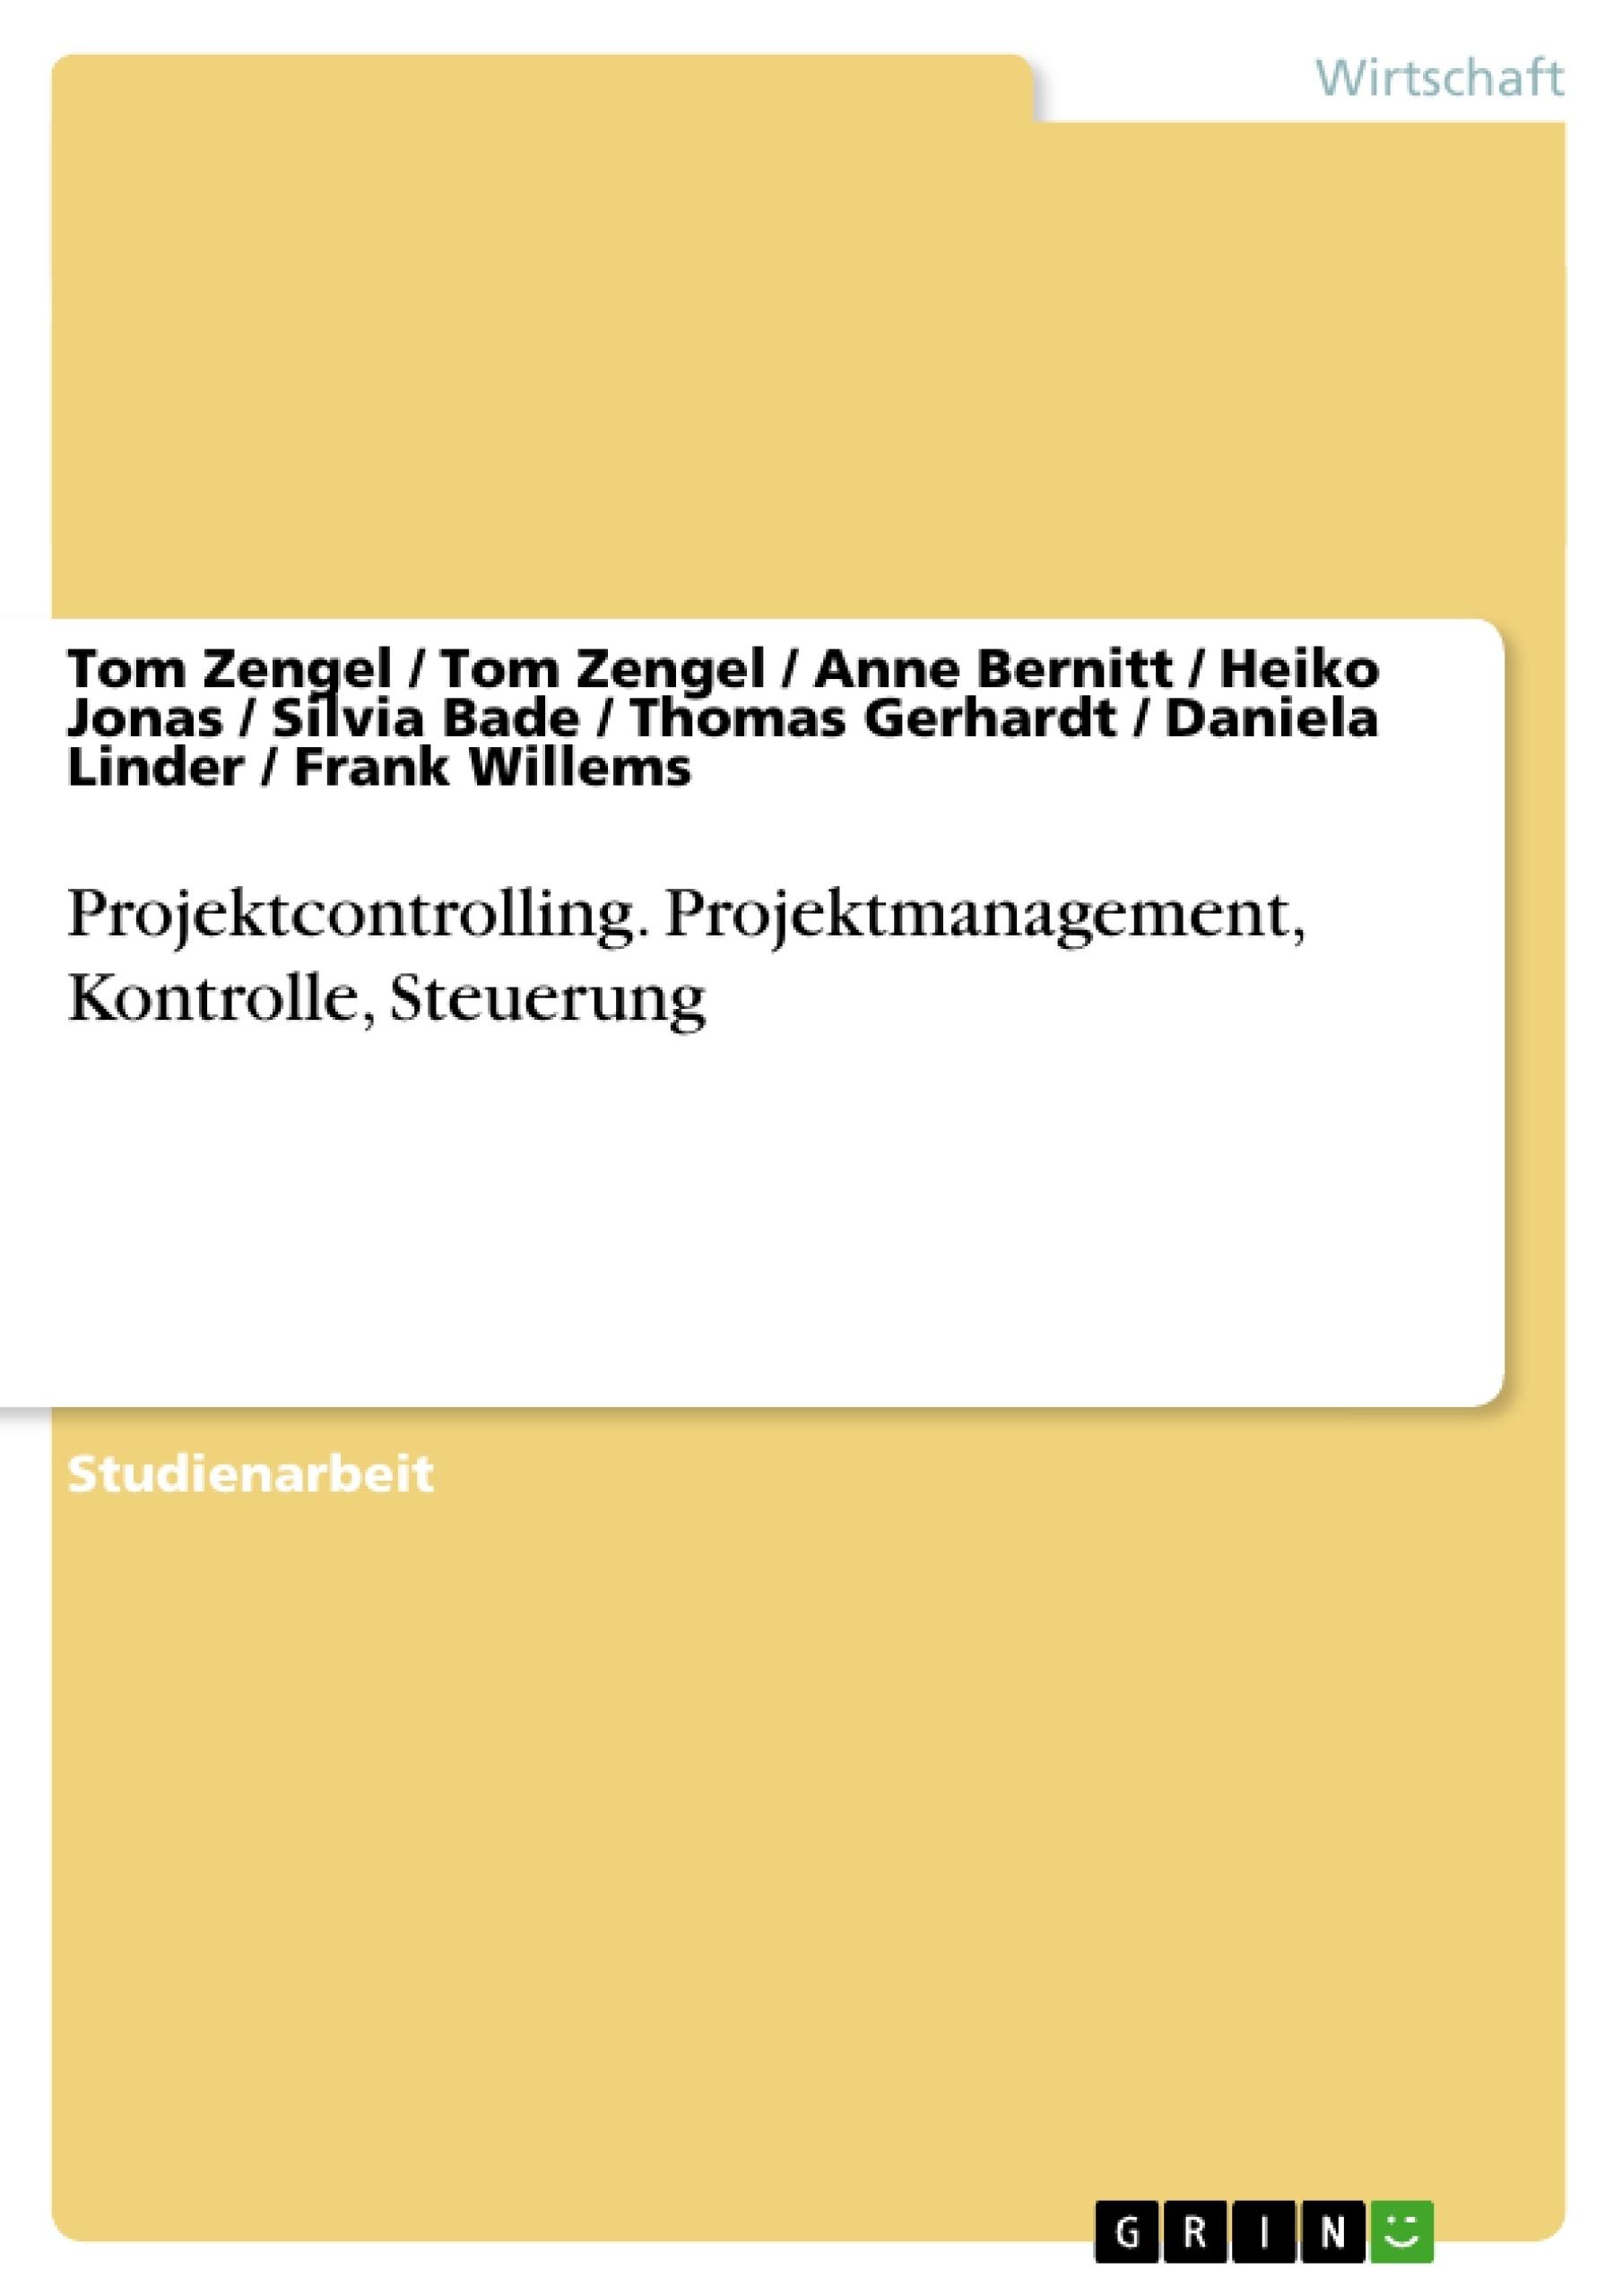 Titel: Projektcontrolling. Projektmanagement, Kontrolle, Steuerung